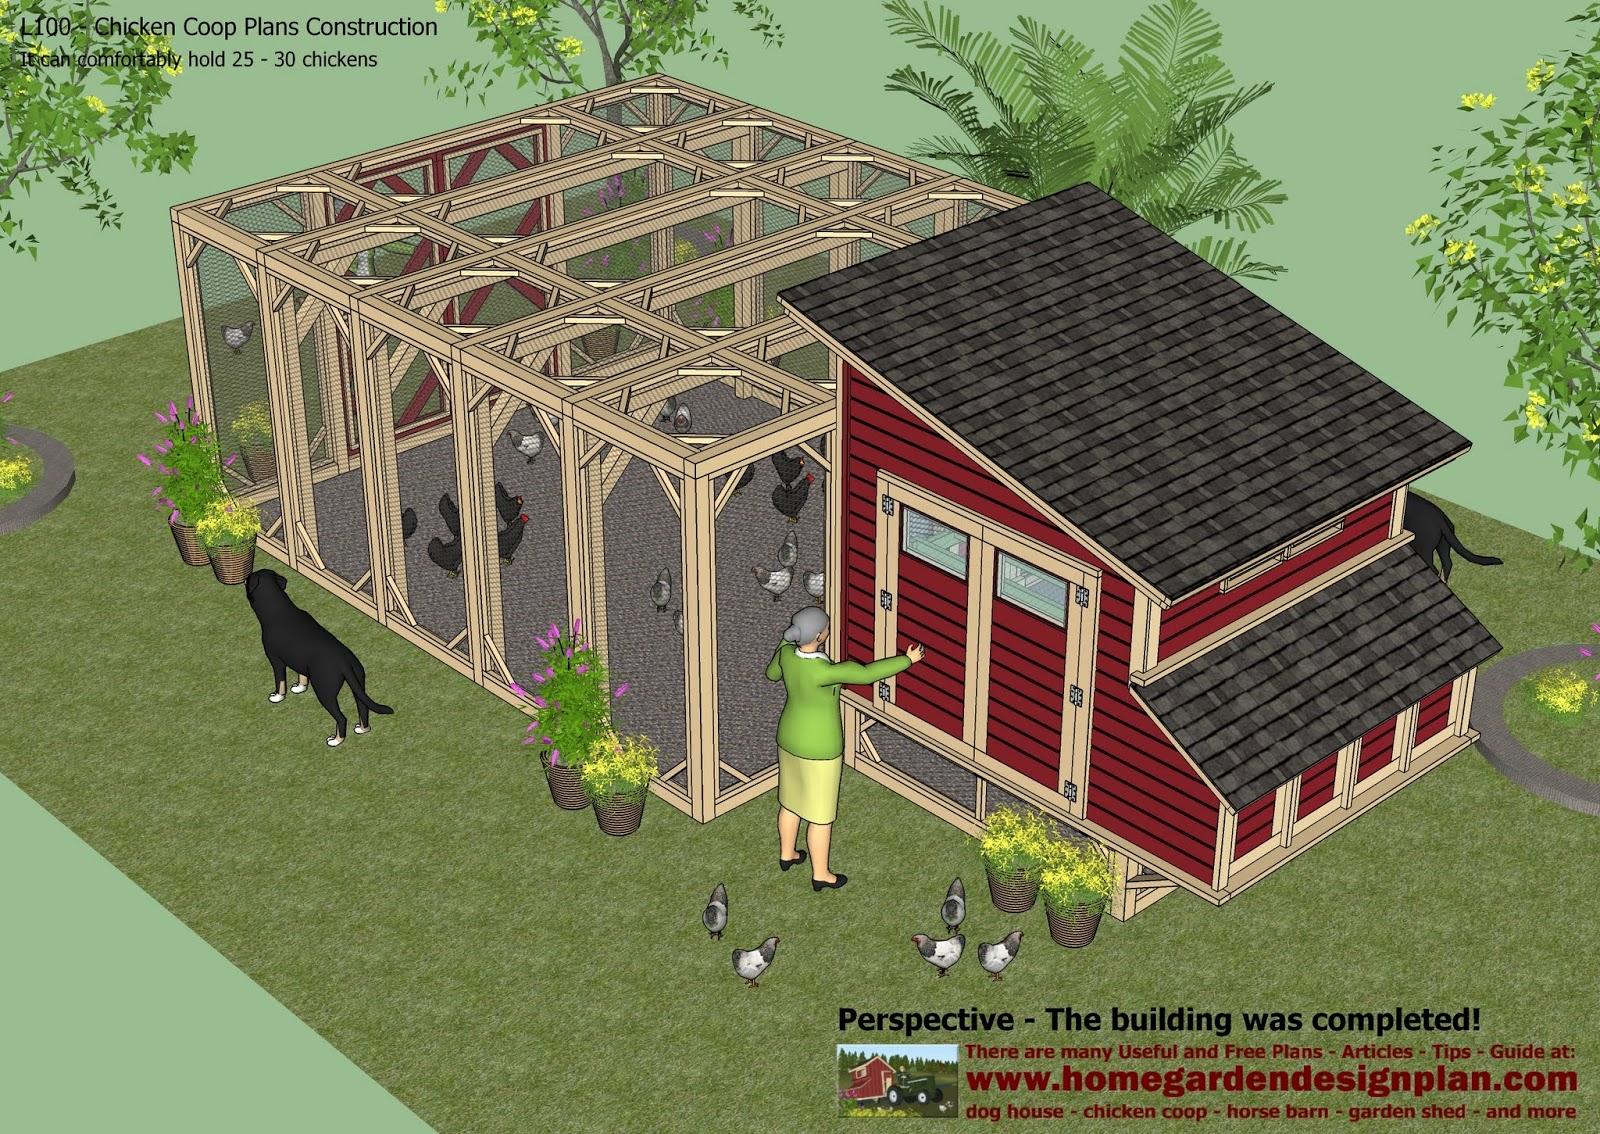 Chicken Coop Design - How To Build A Chicken Coop